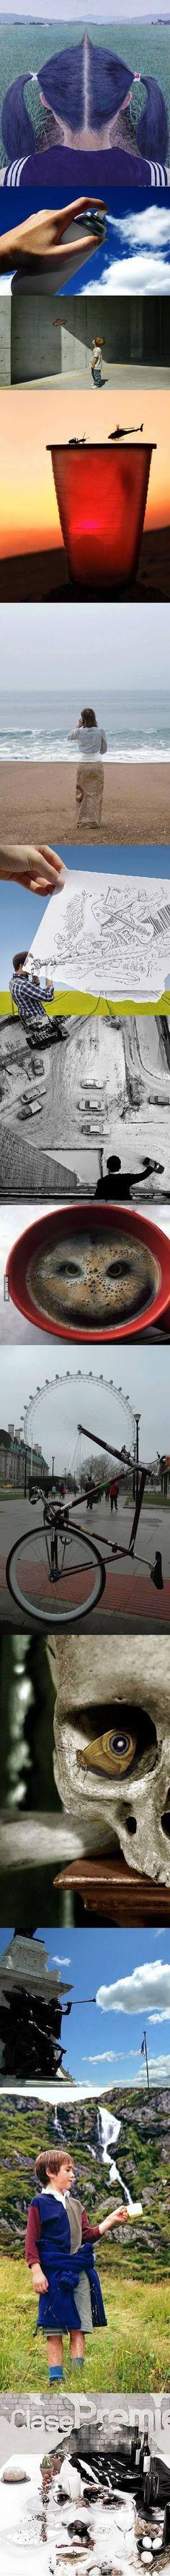 Amazing photo illusions